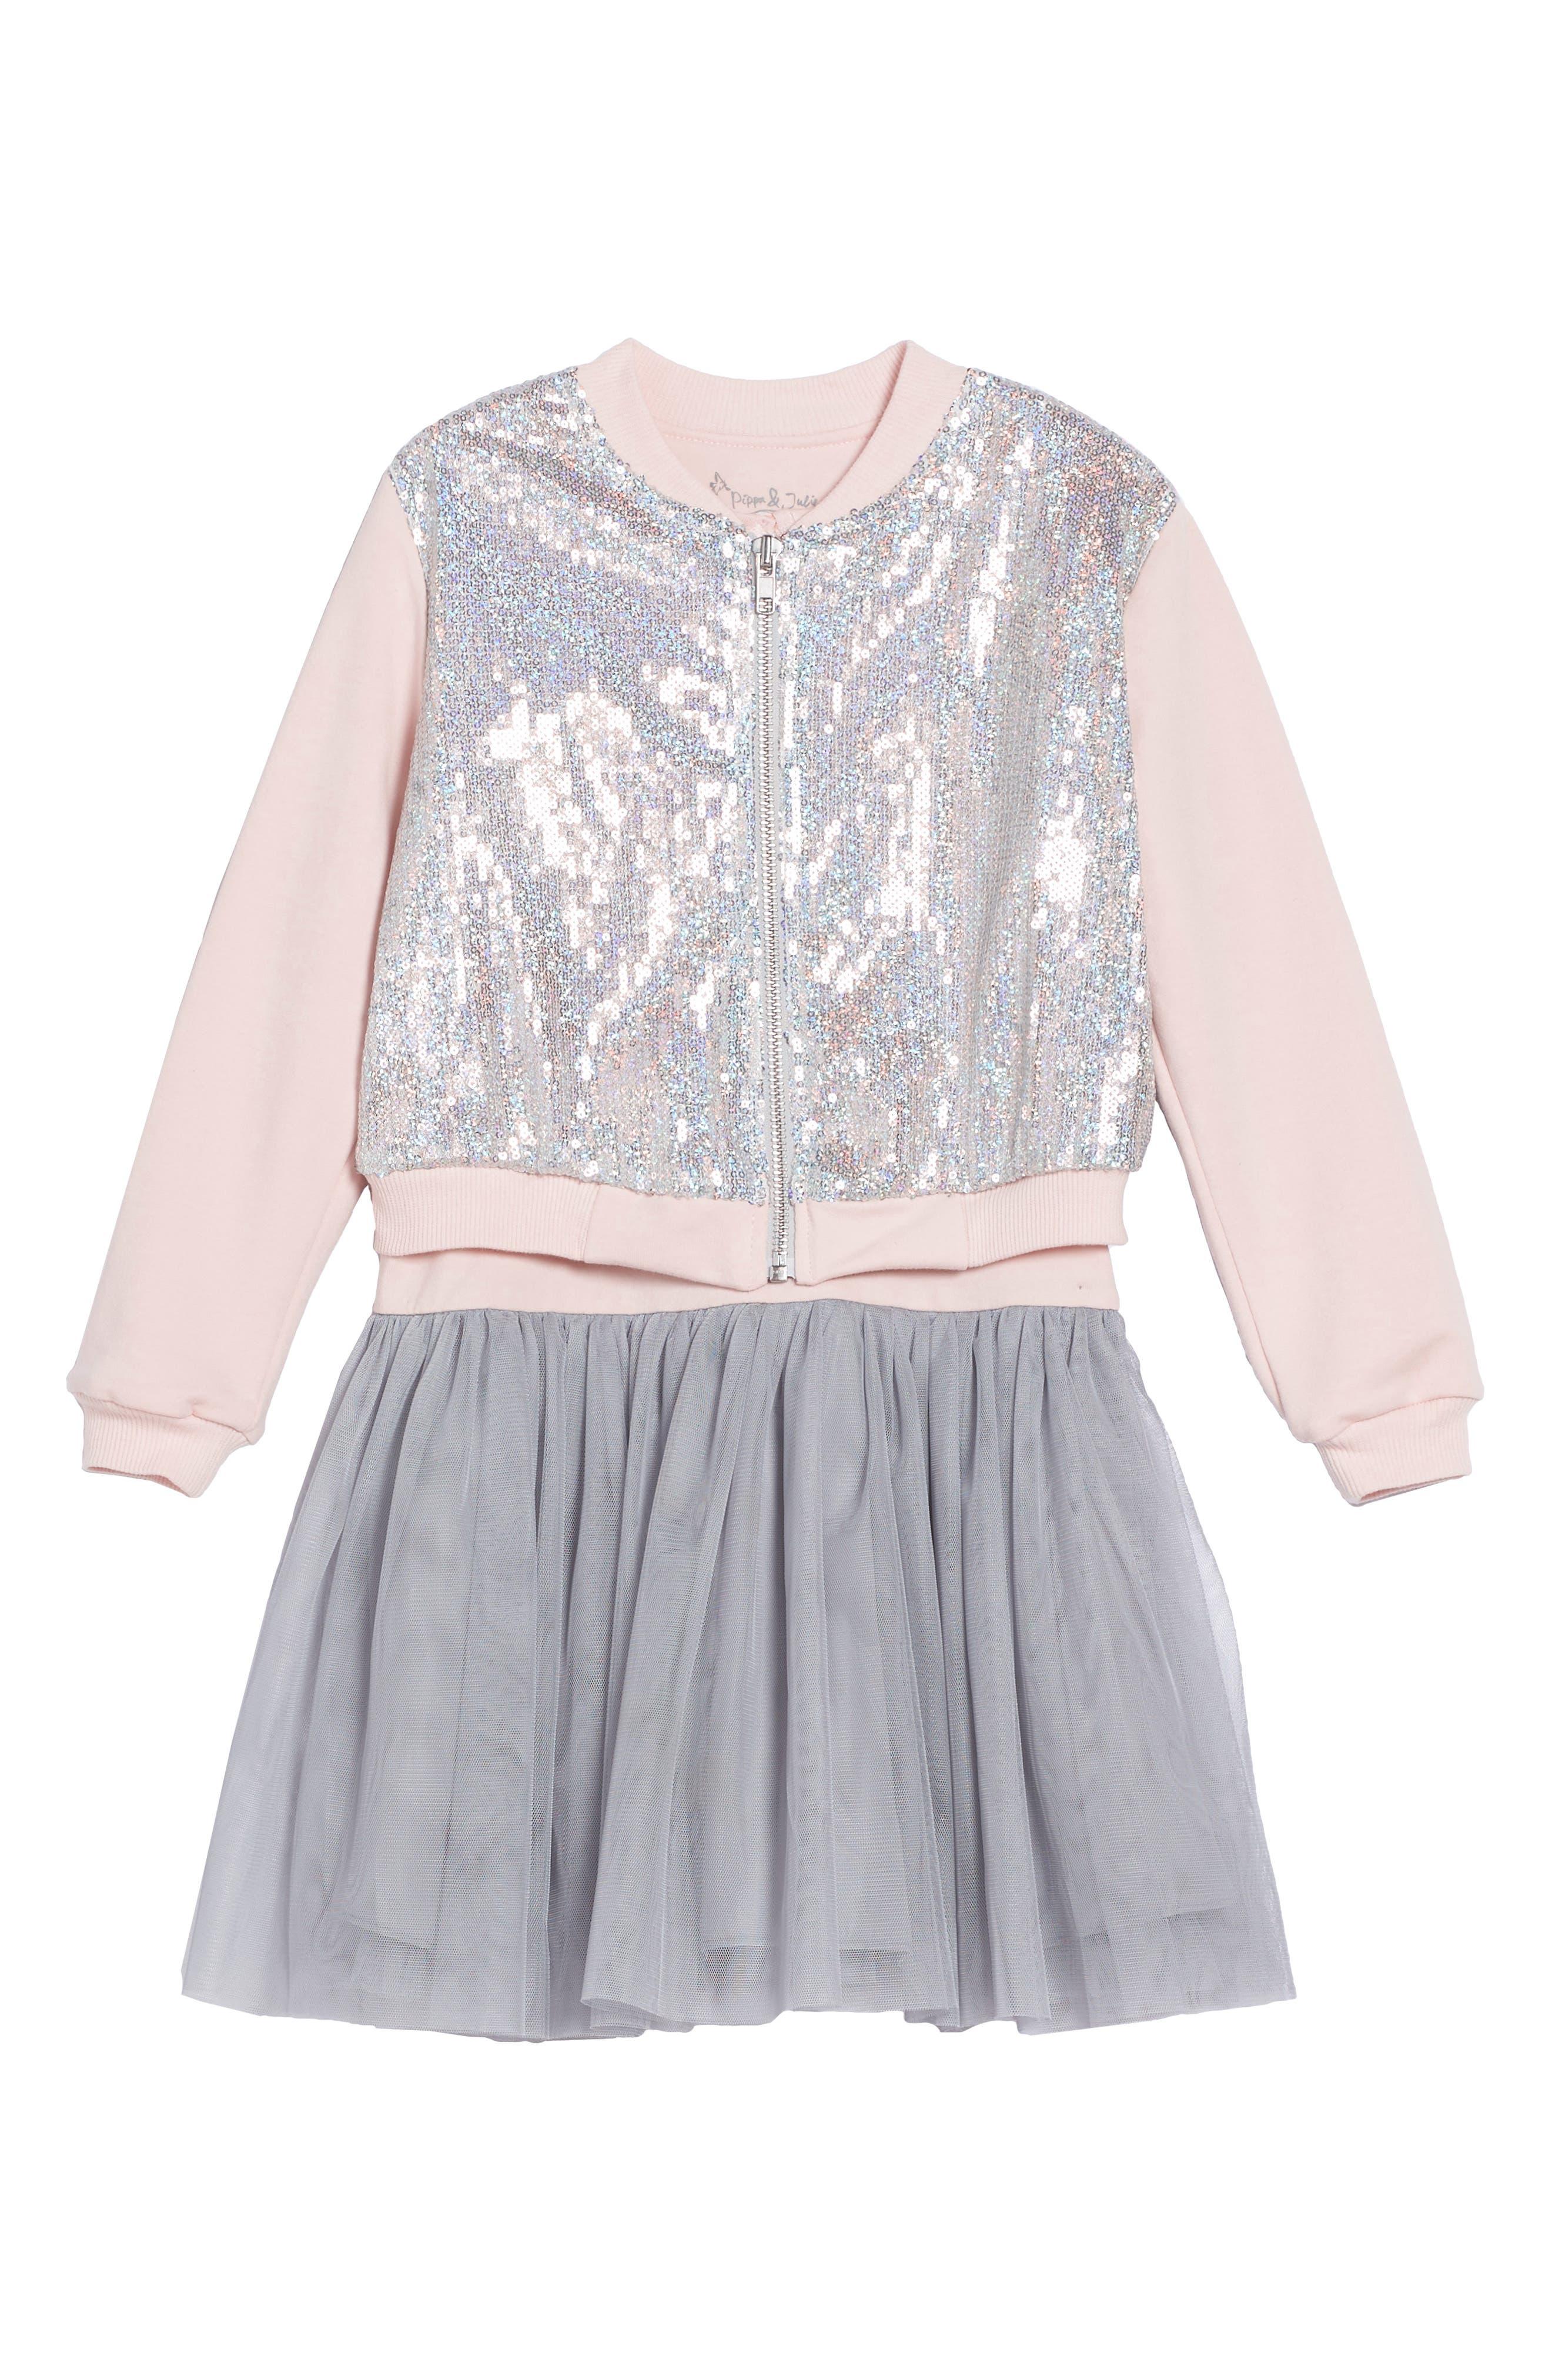 Main Image - Pippa & Julie Tank Dress & Sequin Bomber Jacket Set (Toddler Girls, Little Girls & Big Girls)